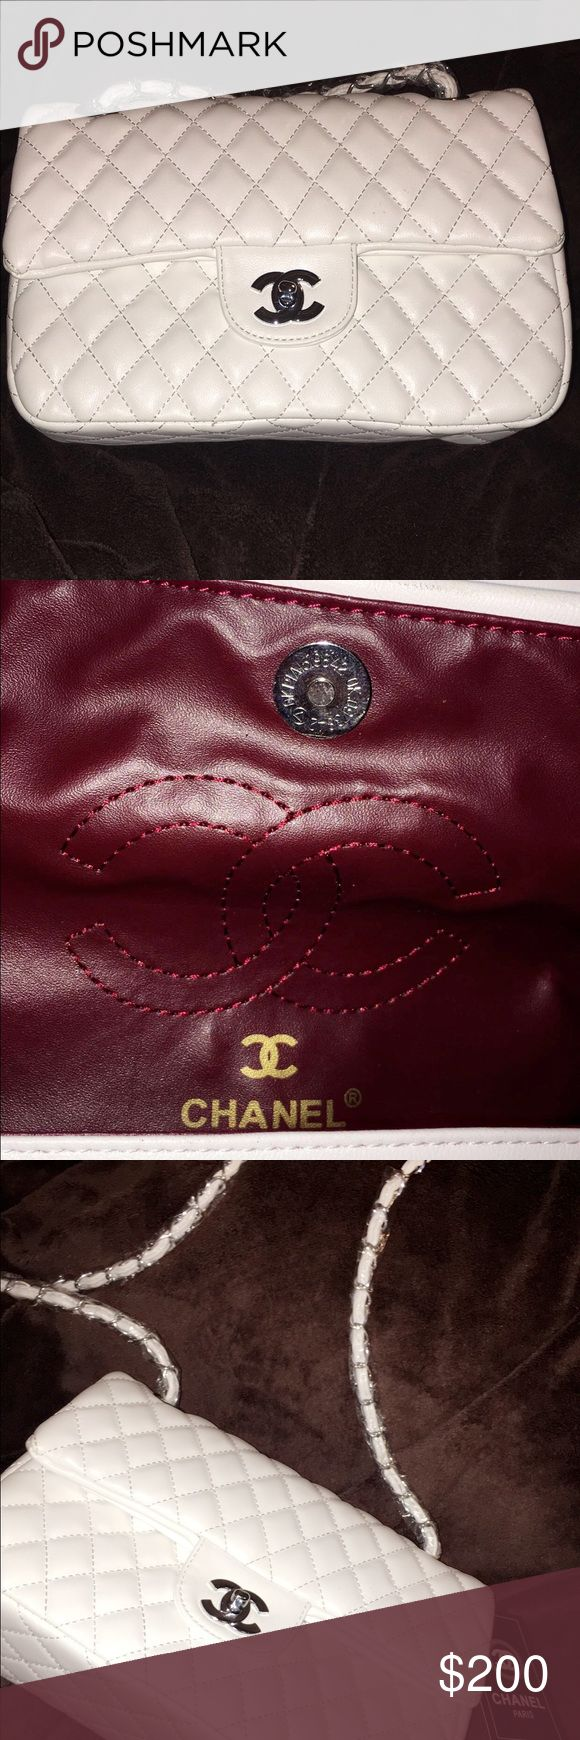 replica bottega veneta handbags wallet address query